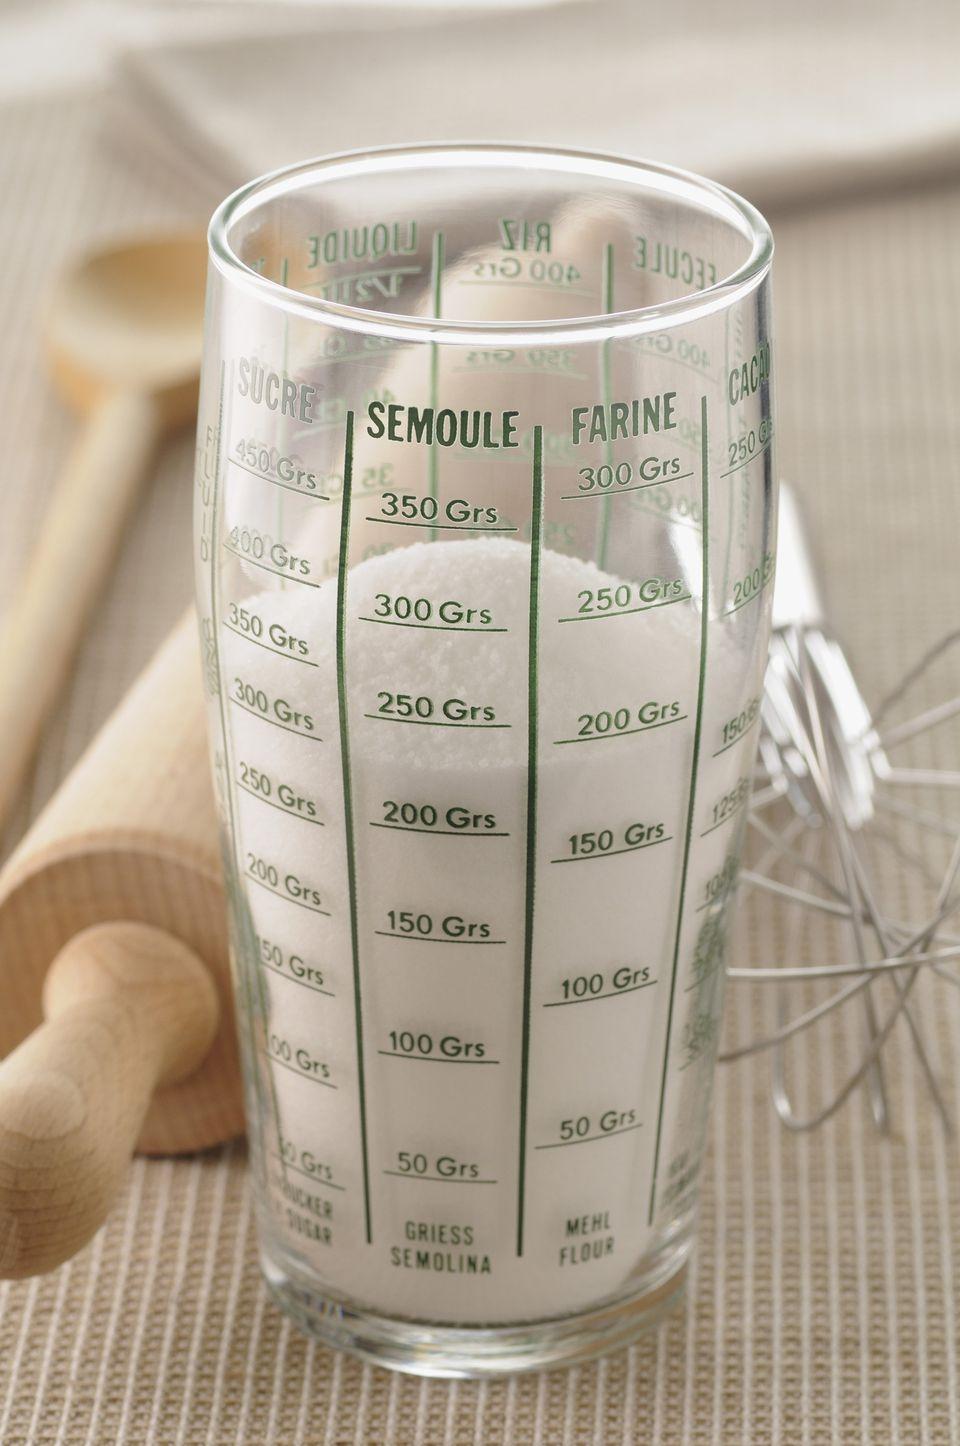 Metric measuring glass